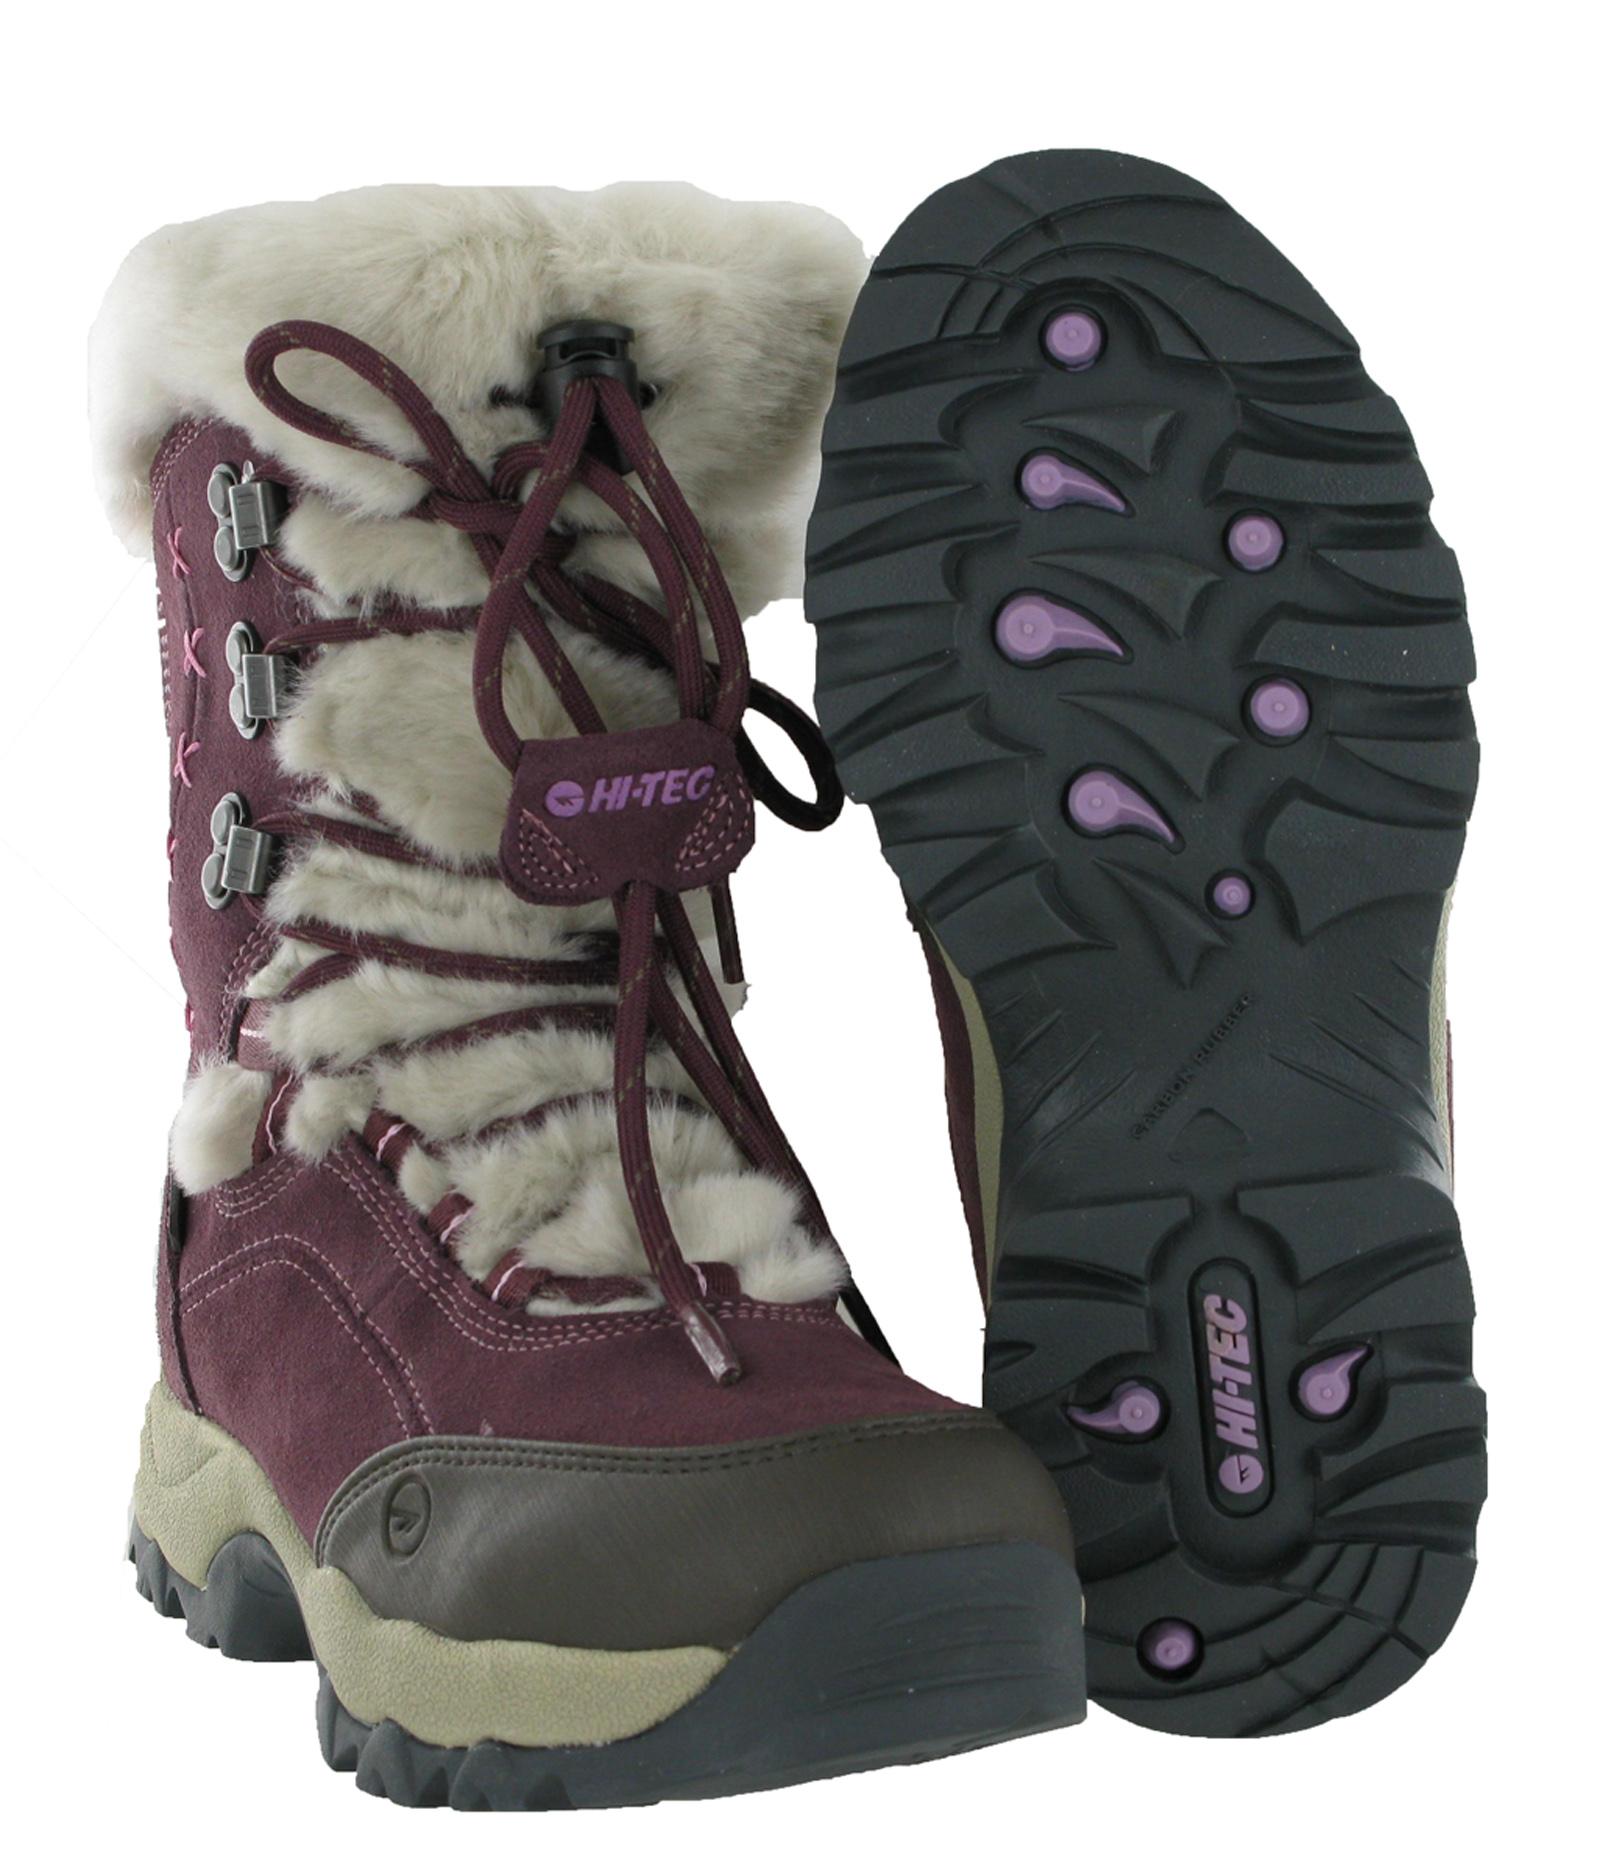 new womens hi tec st moritz waterproof thermal warm snow